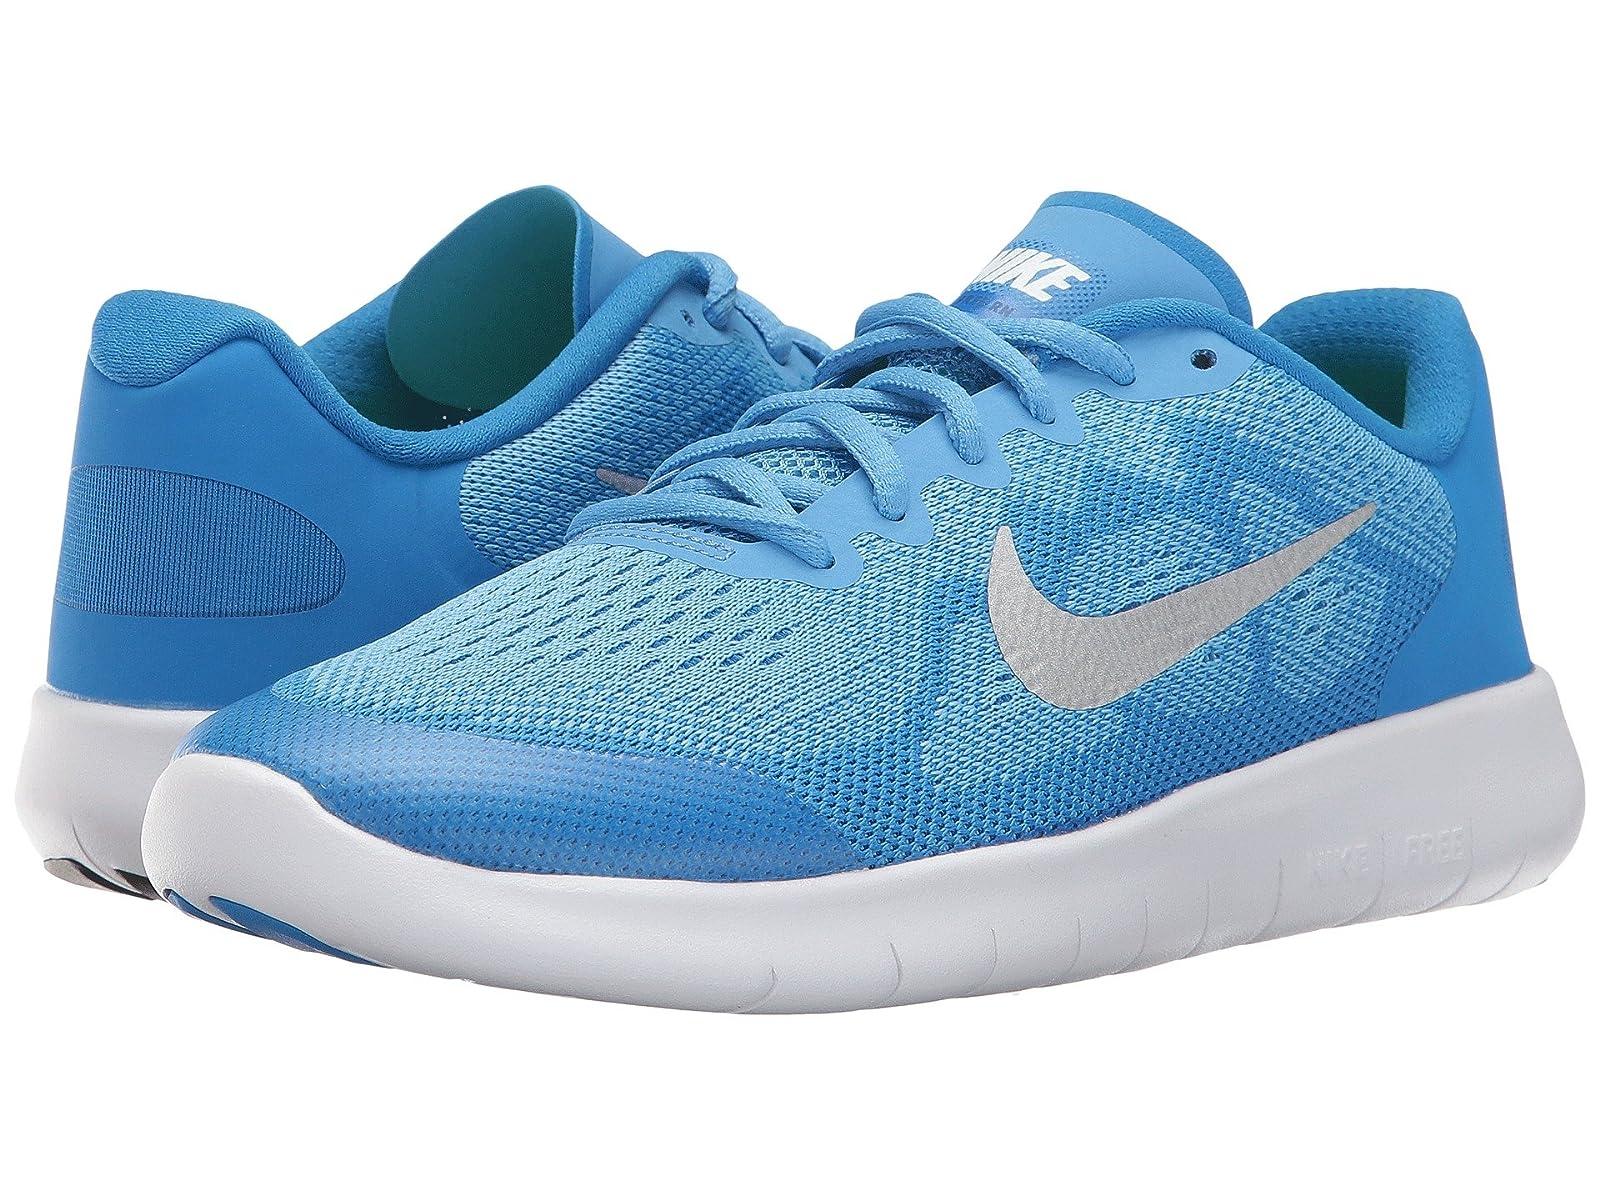 Nike Kids Free RN 2017 (Big Kid)Cheap and distinctive eye-catching shoes